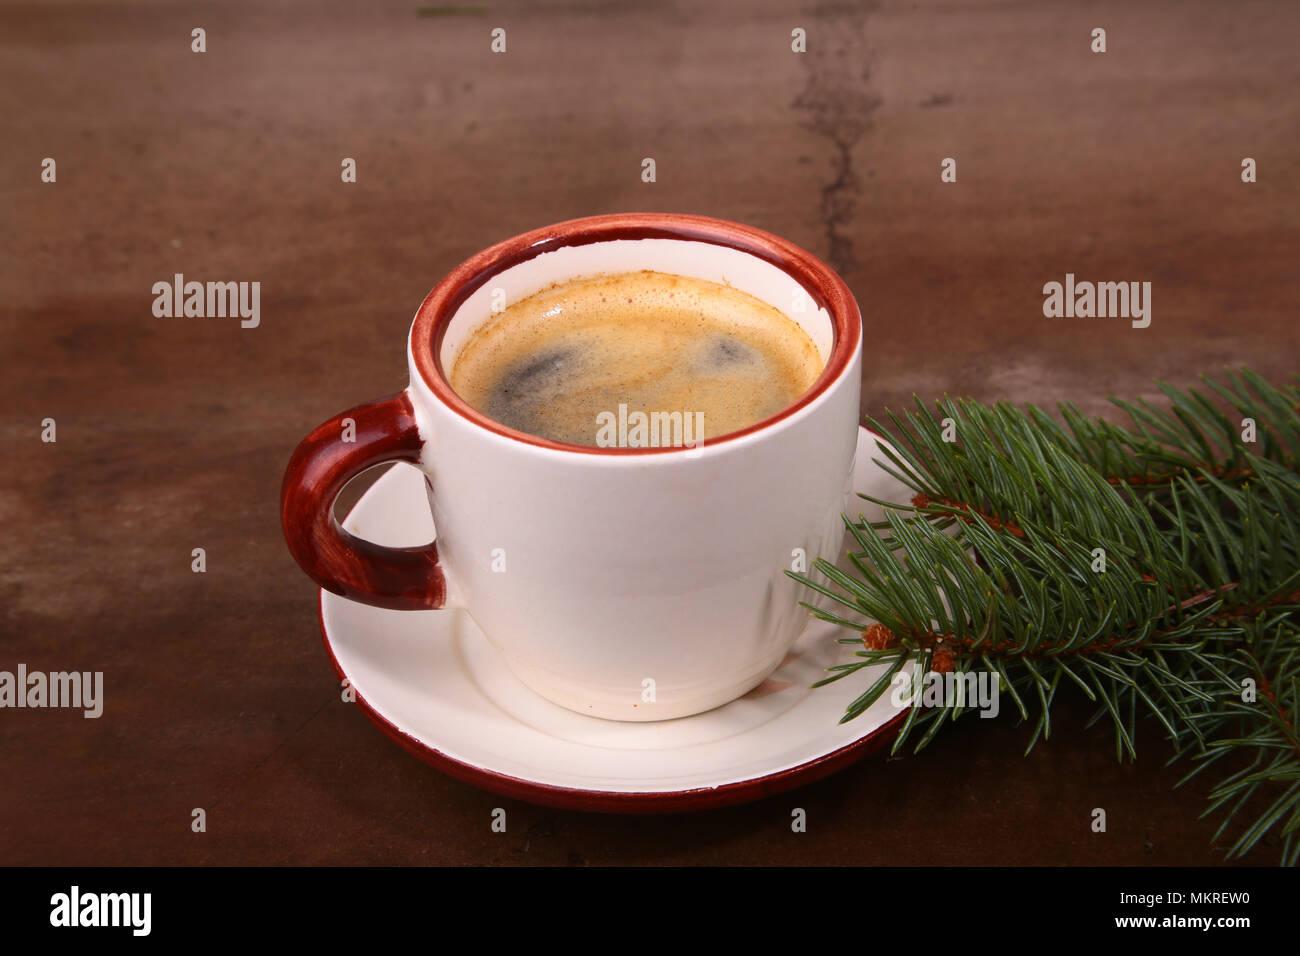 Buenos días o tener un buen día Feliz Navidad .taza de café con galletas y fresca rama de pino o abeto. Imagen De Stock